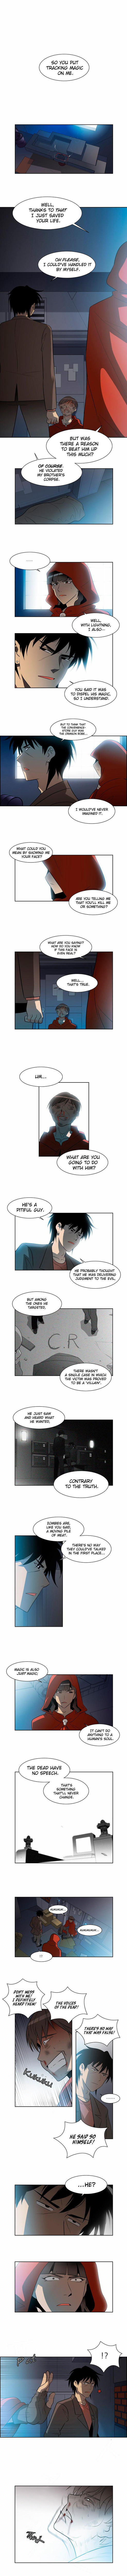 City of Dead Sorcerer 37 Page 1